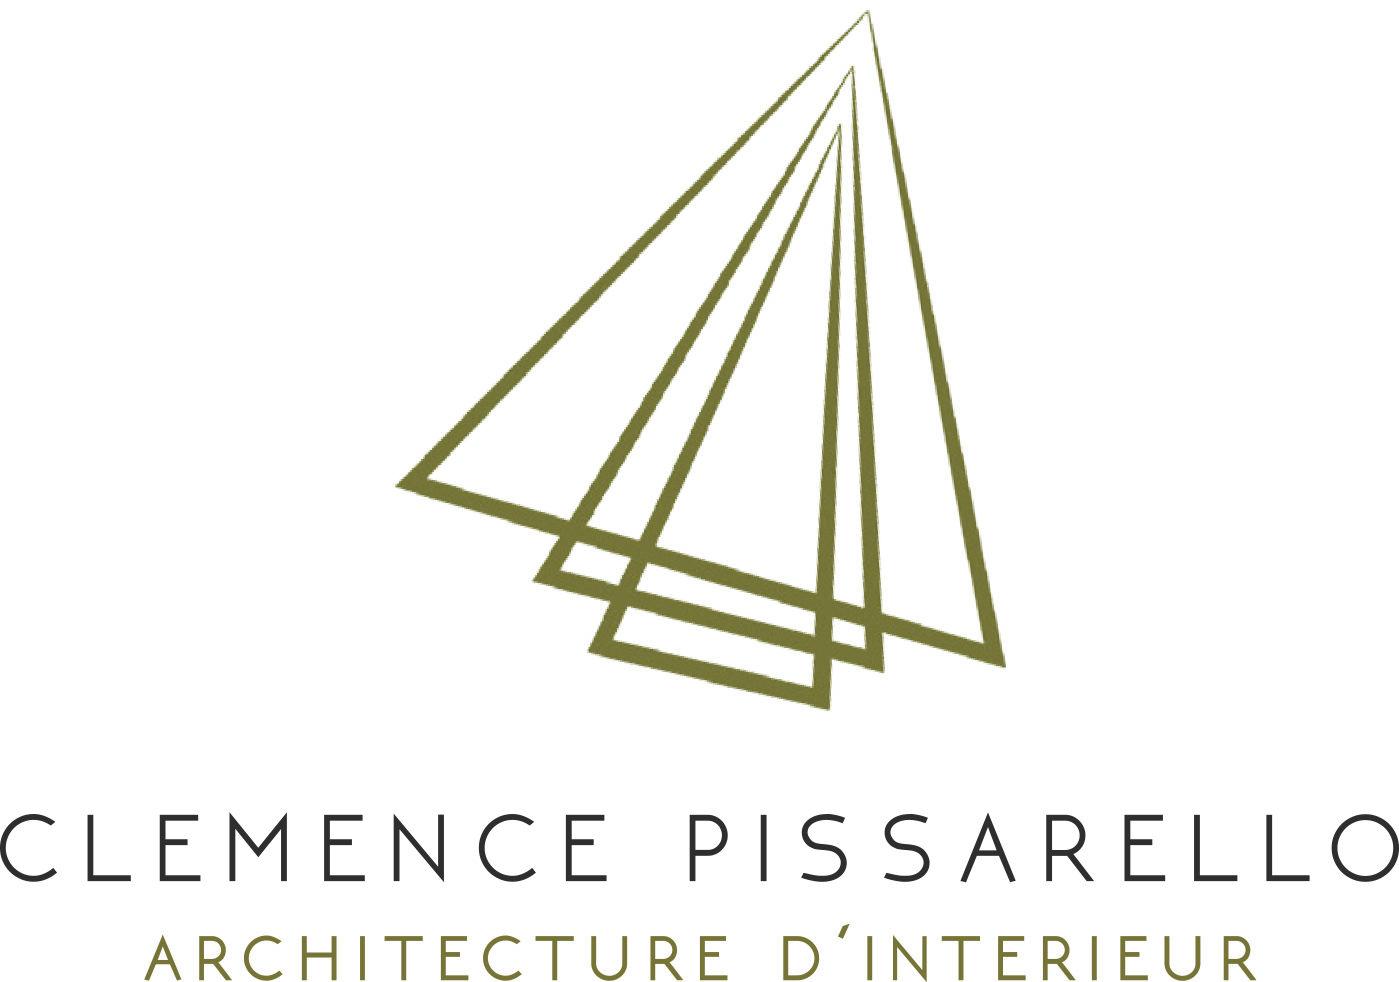 Clémence Pissarello